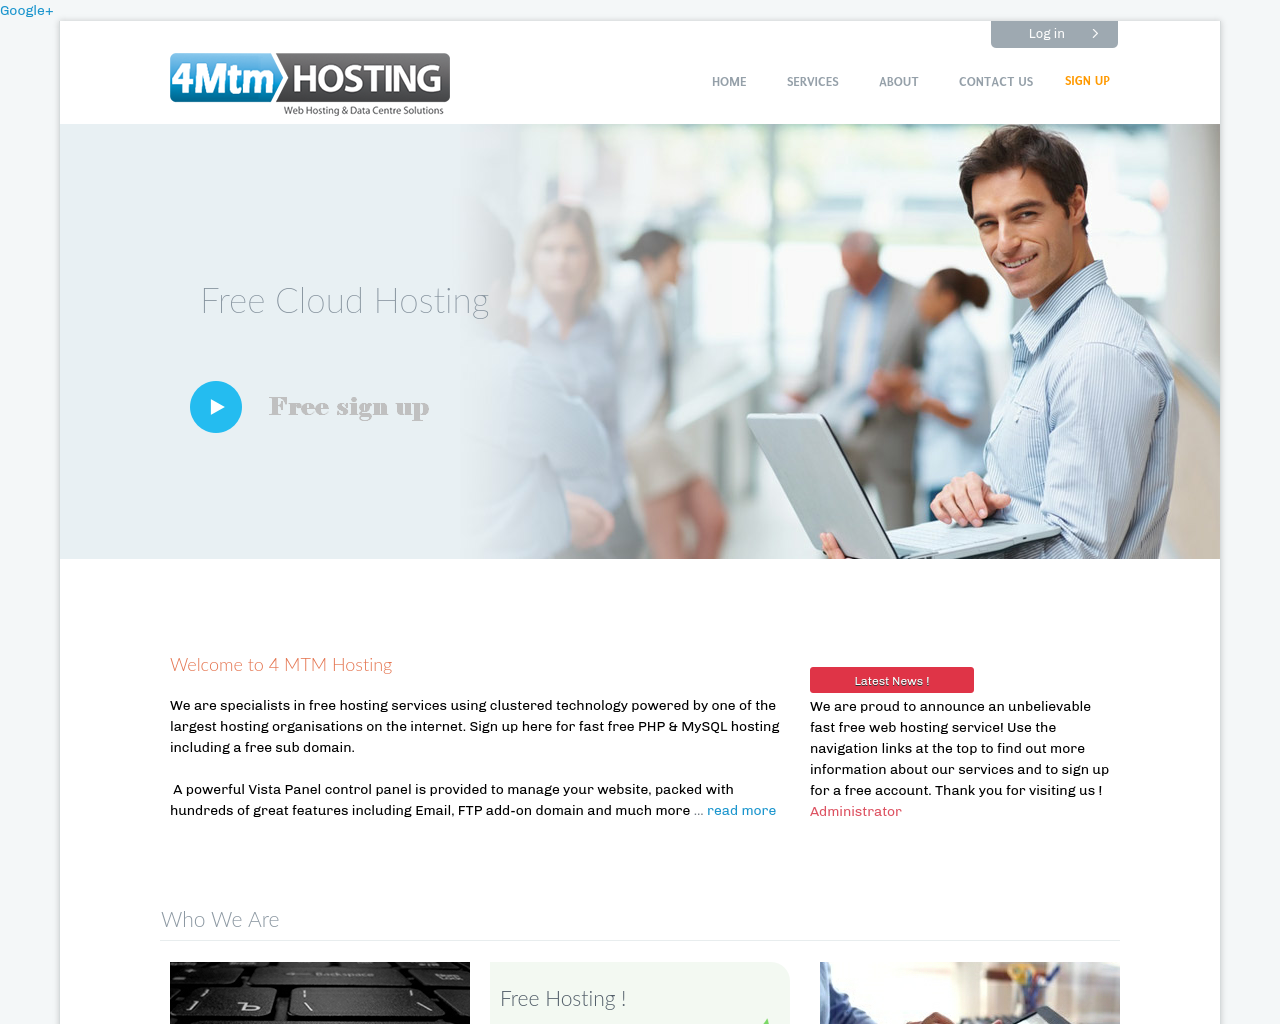 4MTM-Hosting-Advertising-Reviews-Pricing